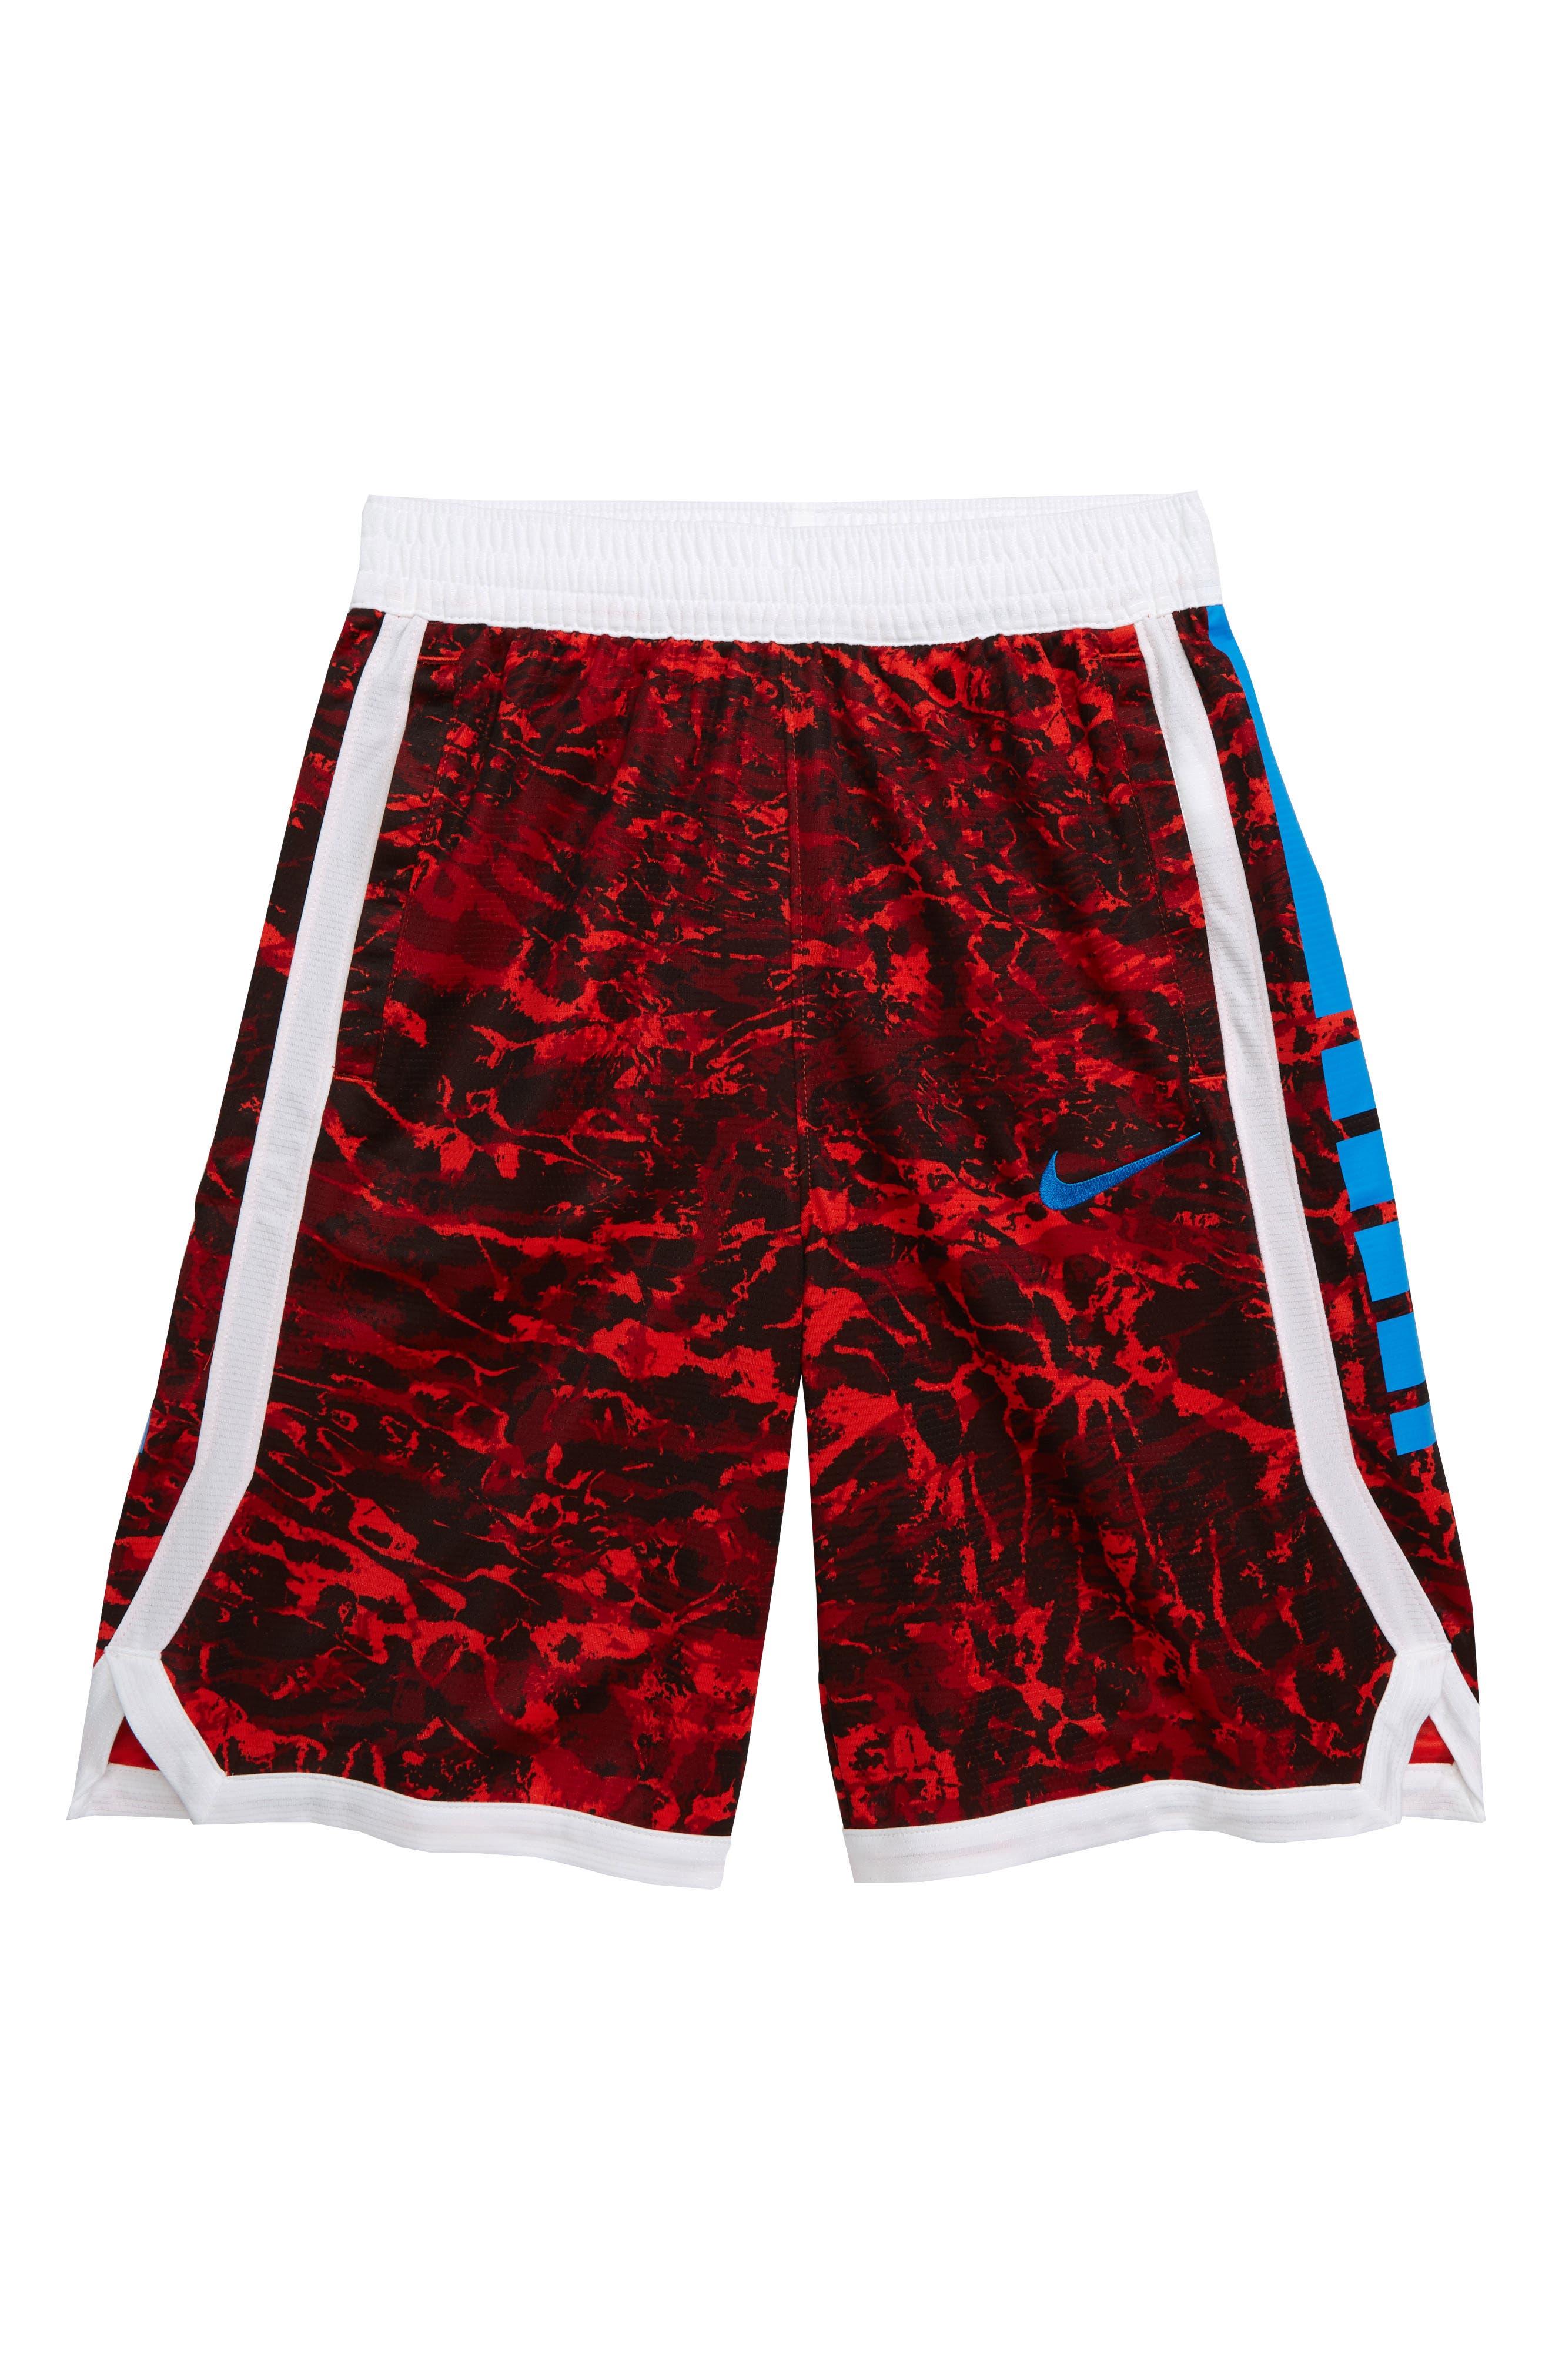 ca5e62b67c2c nike elite shorts youth